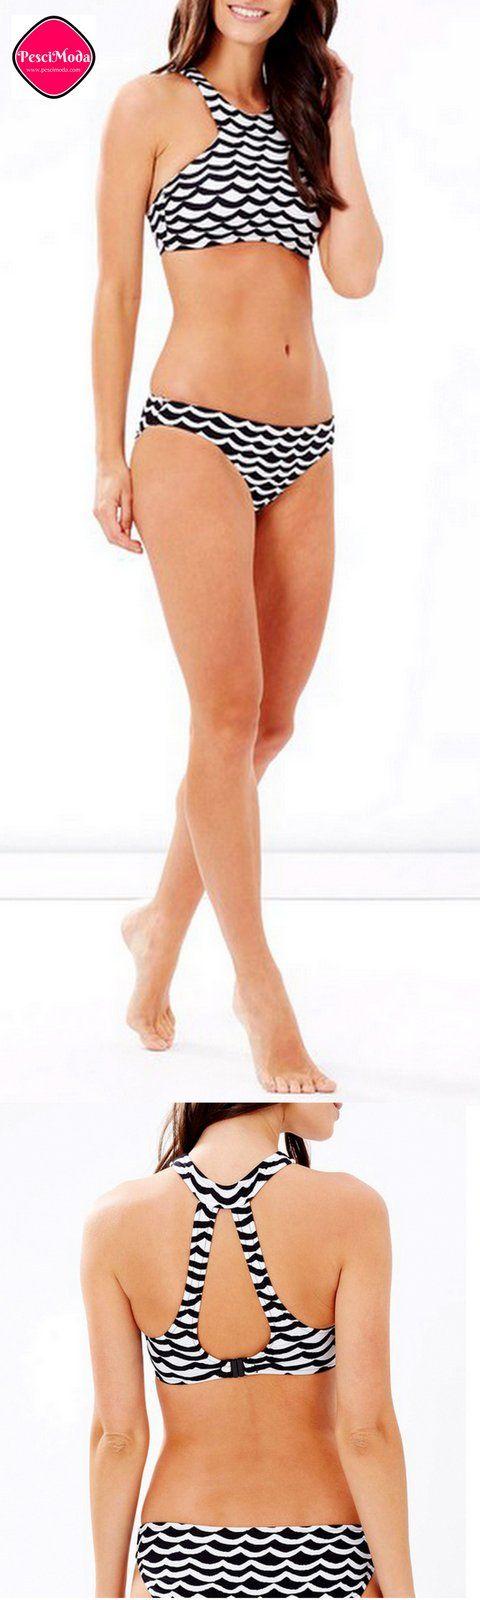 New Hot Wave Pattern Bikini Set. Get Additional 10% Off your First order at www.pescimoda.com #Swim, #Bathing #Swimwear #Bikinis #BikiniBody #Swimsuit #Fashion #FashionStyles #Woman'sFashion #BikinisForTeens #Bikinis2016 #SummerOutfits #SummerOutfitsWomen #SummerFashion #TwoPieceSwimwear #TwoPieceSwimsuits #TwoPieceSwimsuitsForTeens #TwoPieceSwimsuitForCurves